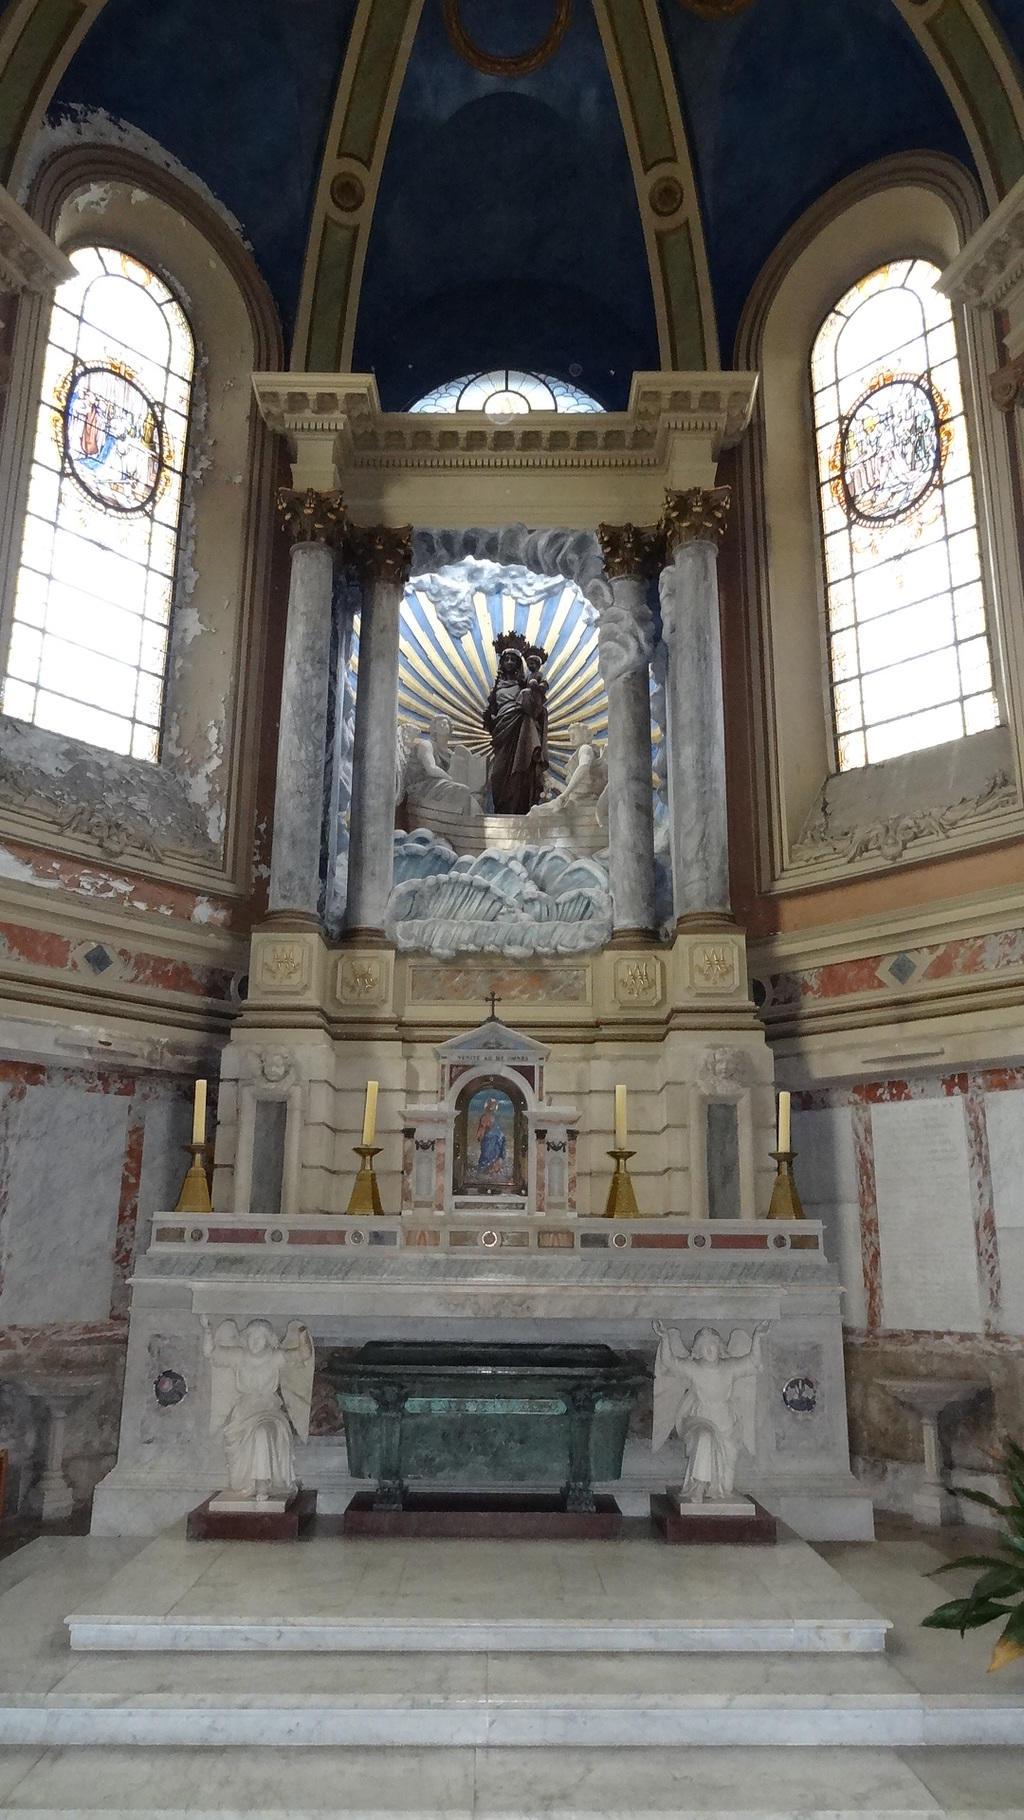 Notre-Dame de Boulogne, French Heritage monument to Boulogne sur mer.